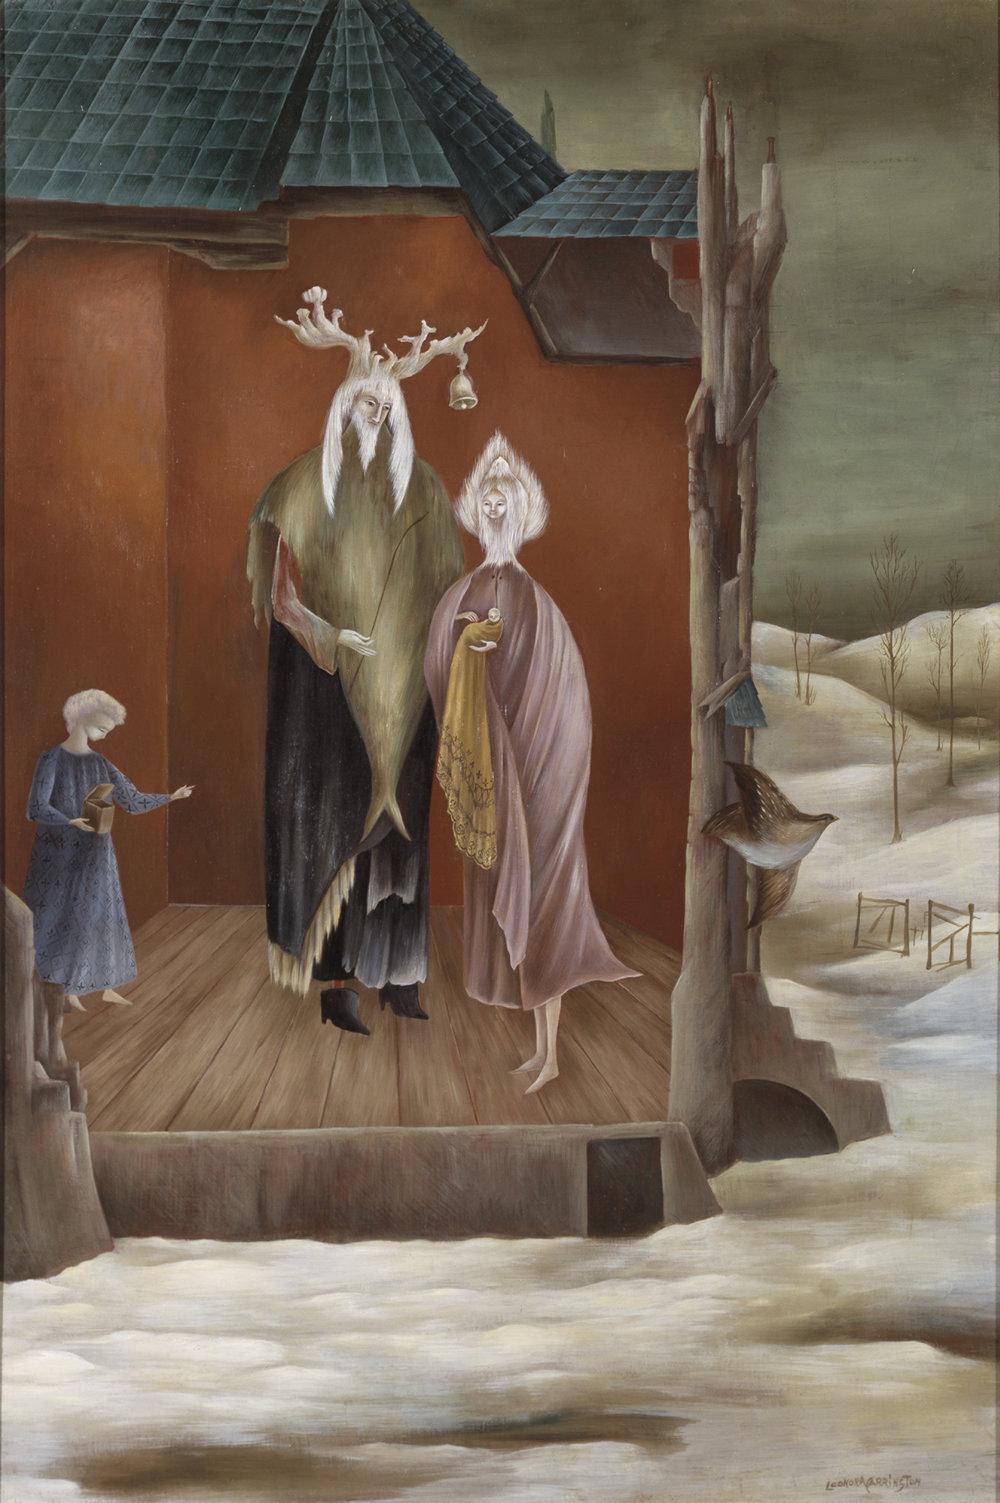 Leonora Carrington,  Le Bon Roi Dagobert , 1948, Oil on canvas, 35 3/8 x 23 5/8 inches (90 x 60 cm), © 2019 Estate of Leonora Carrington / Artists Rights Society (ARS), New York